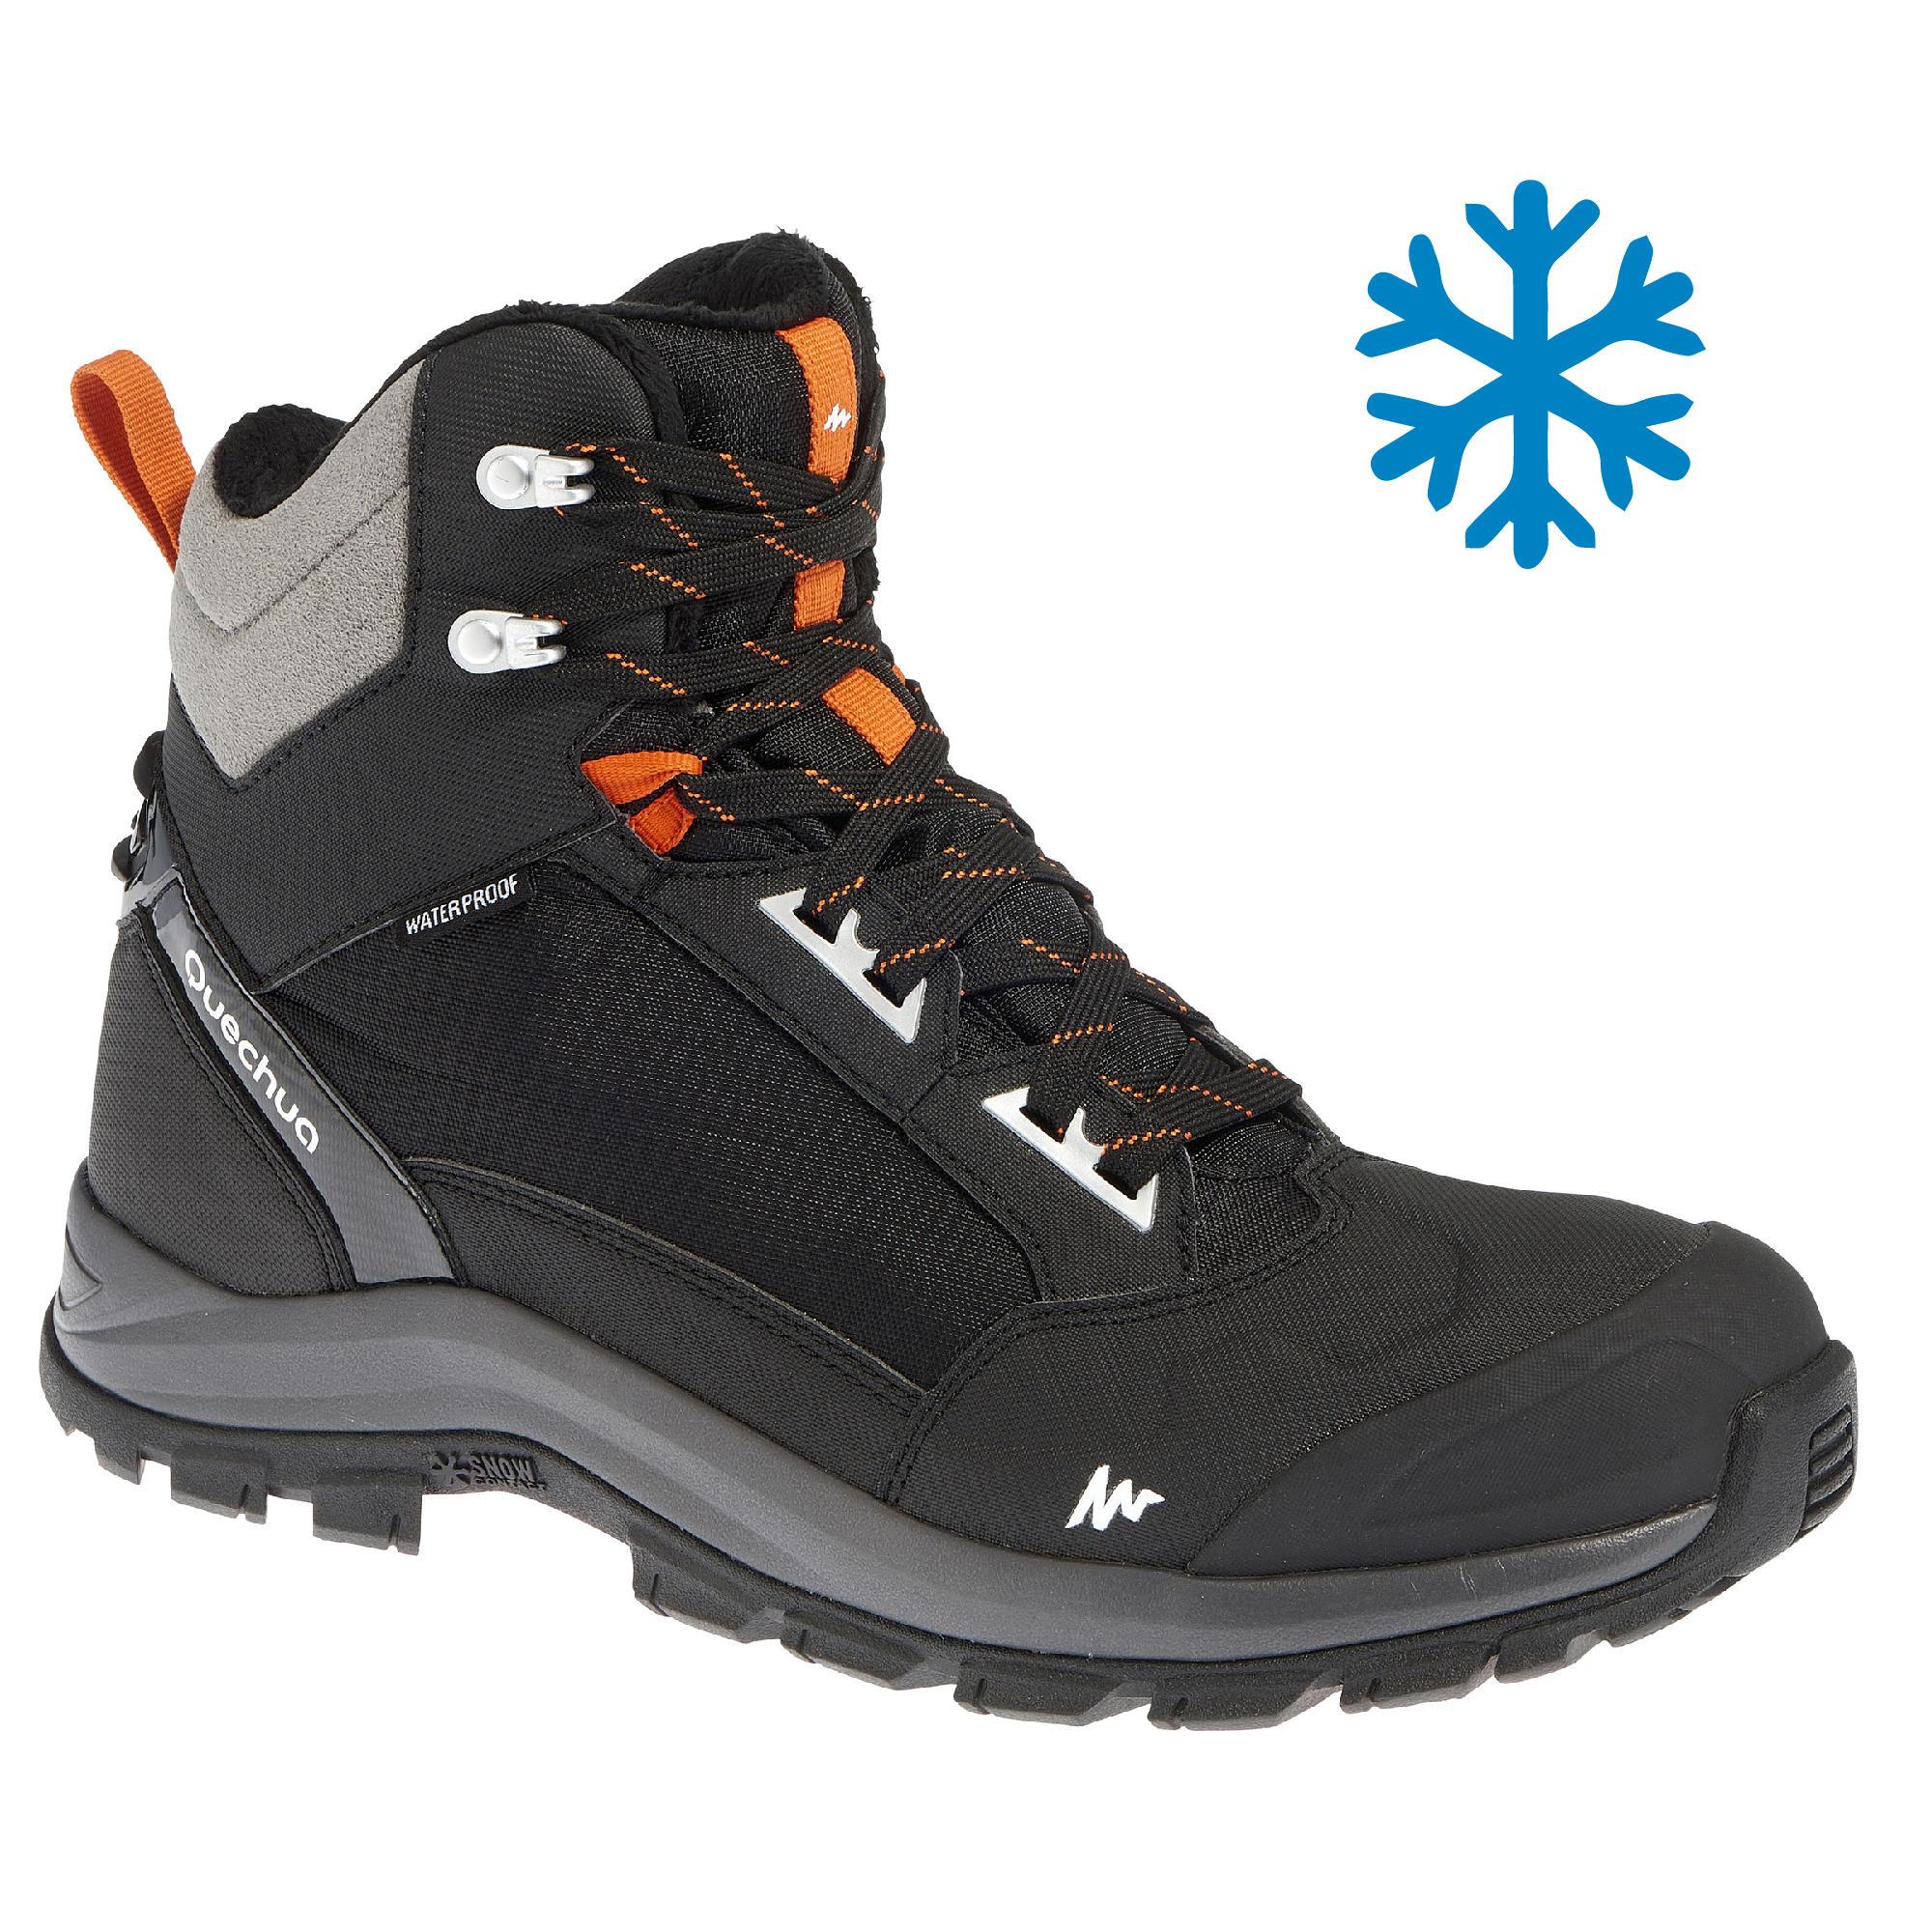 SH520 Quechua Snow Hiking Shoes for Men